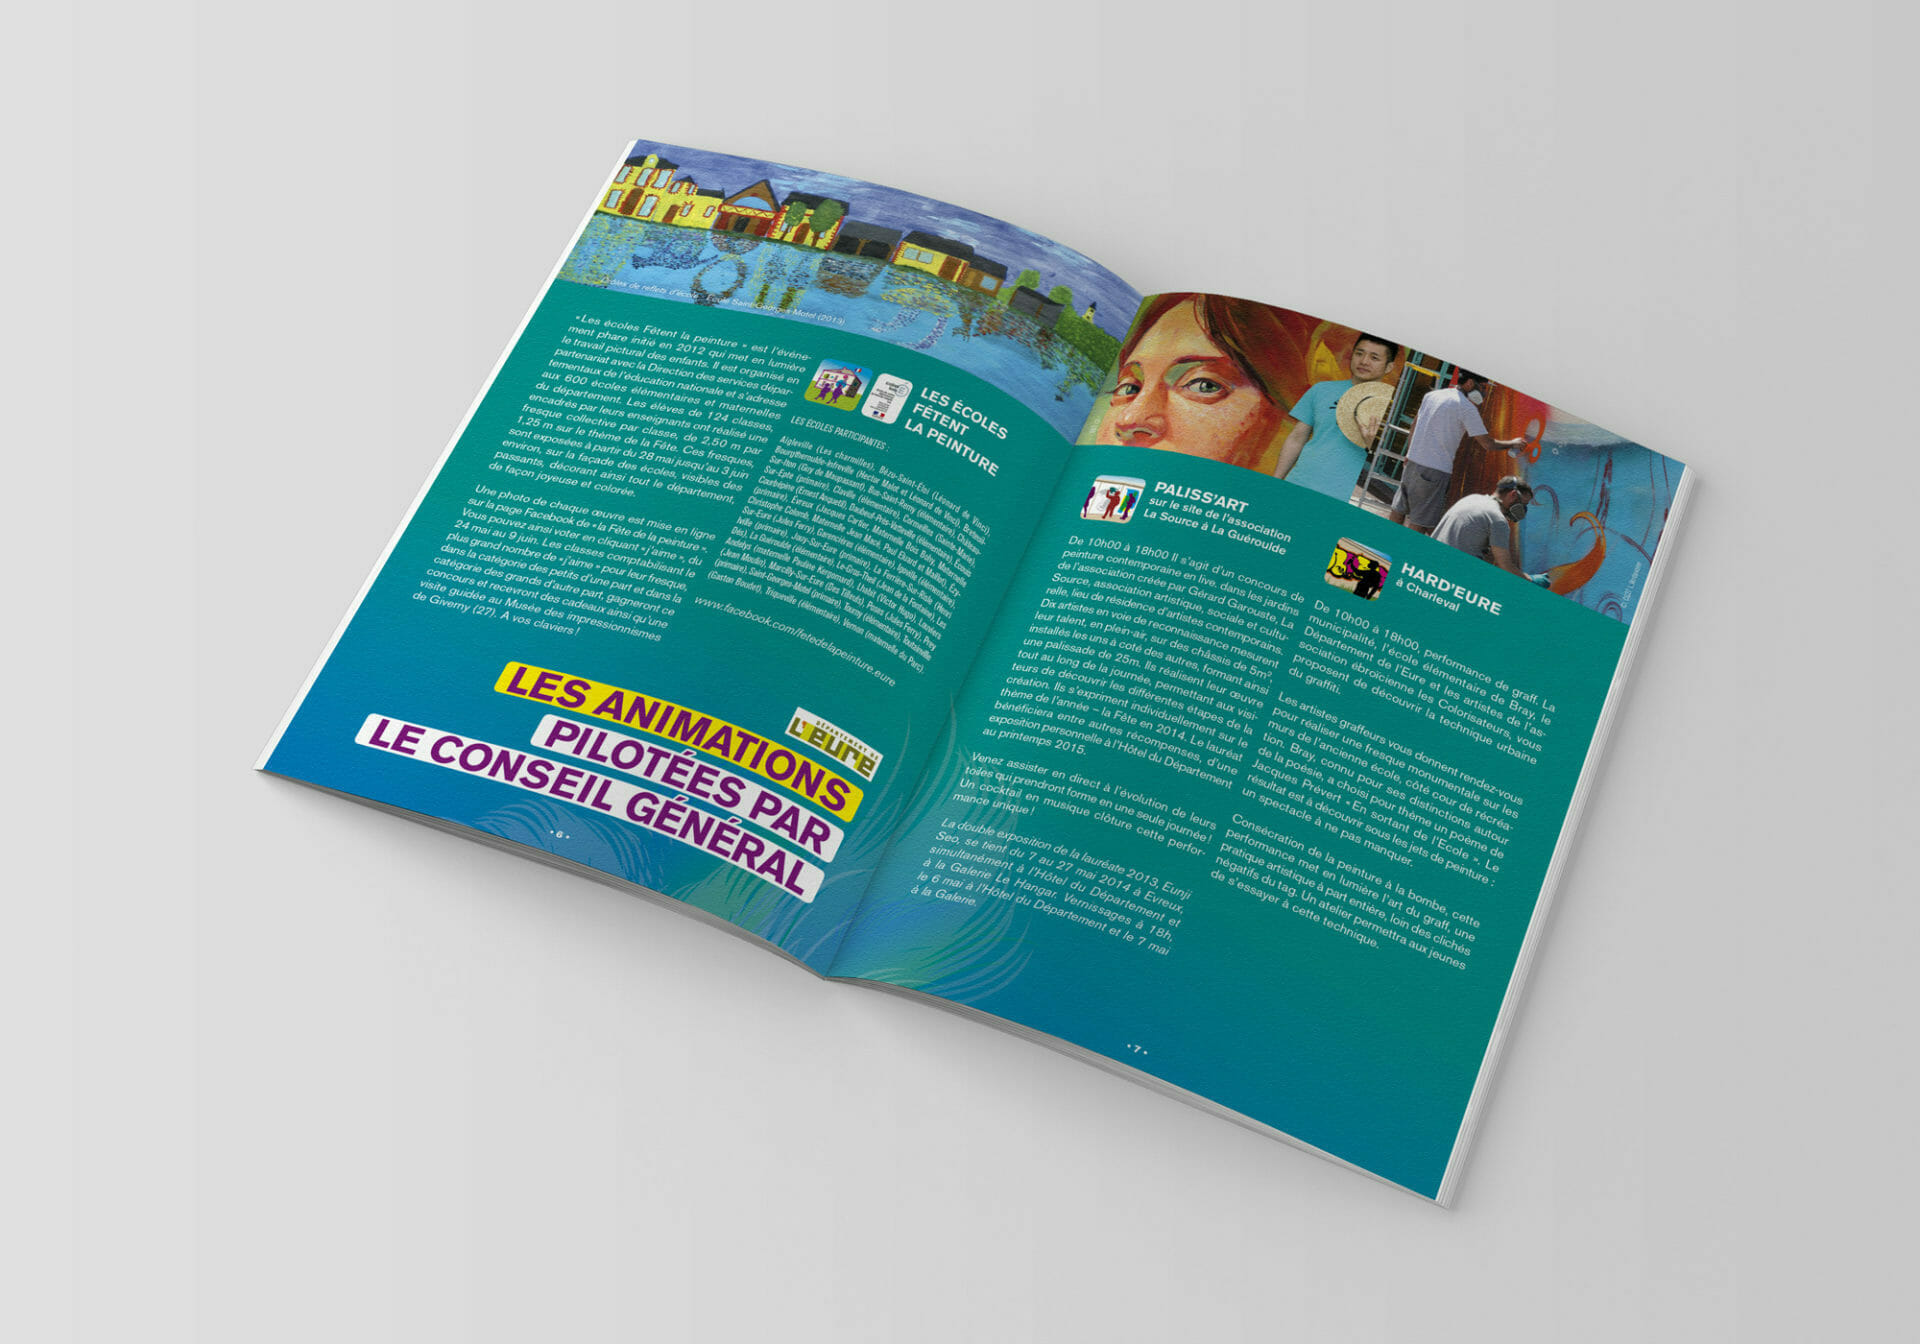 FP2014-programme-mockup-05